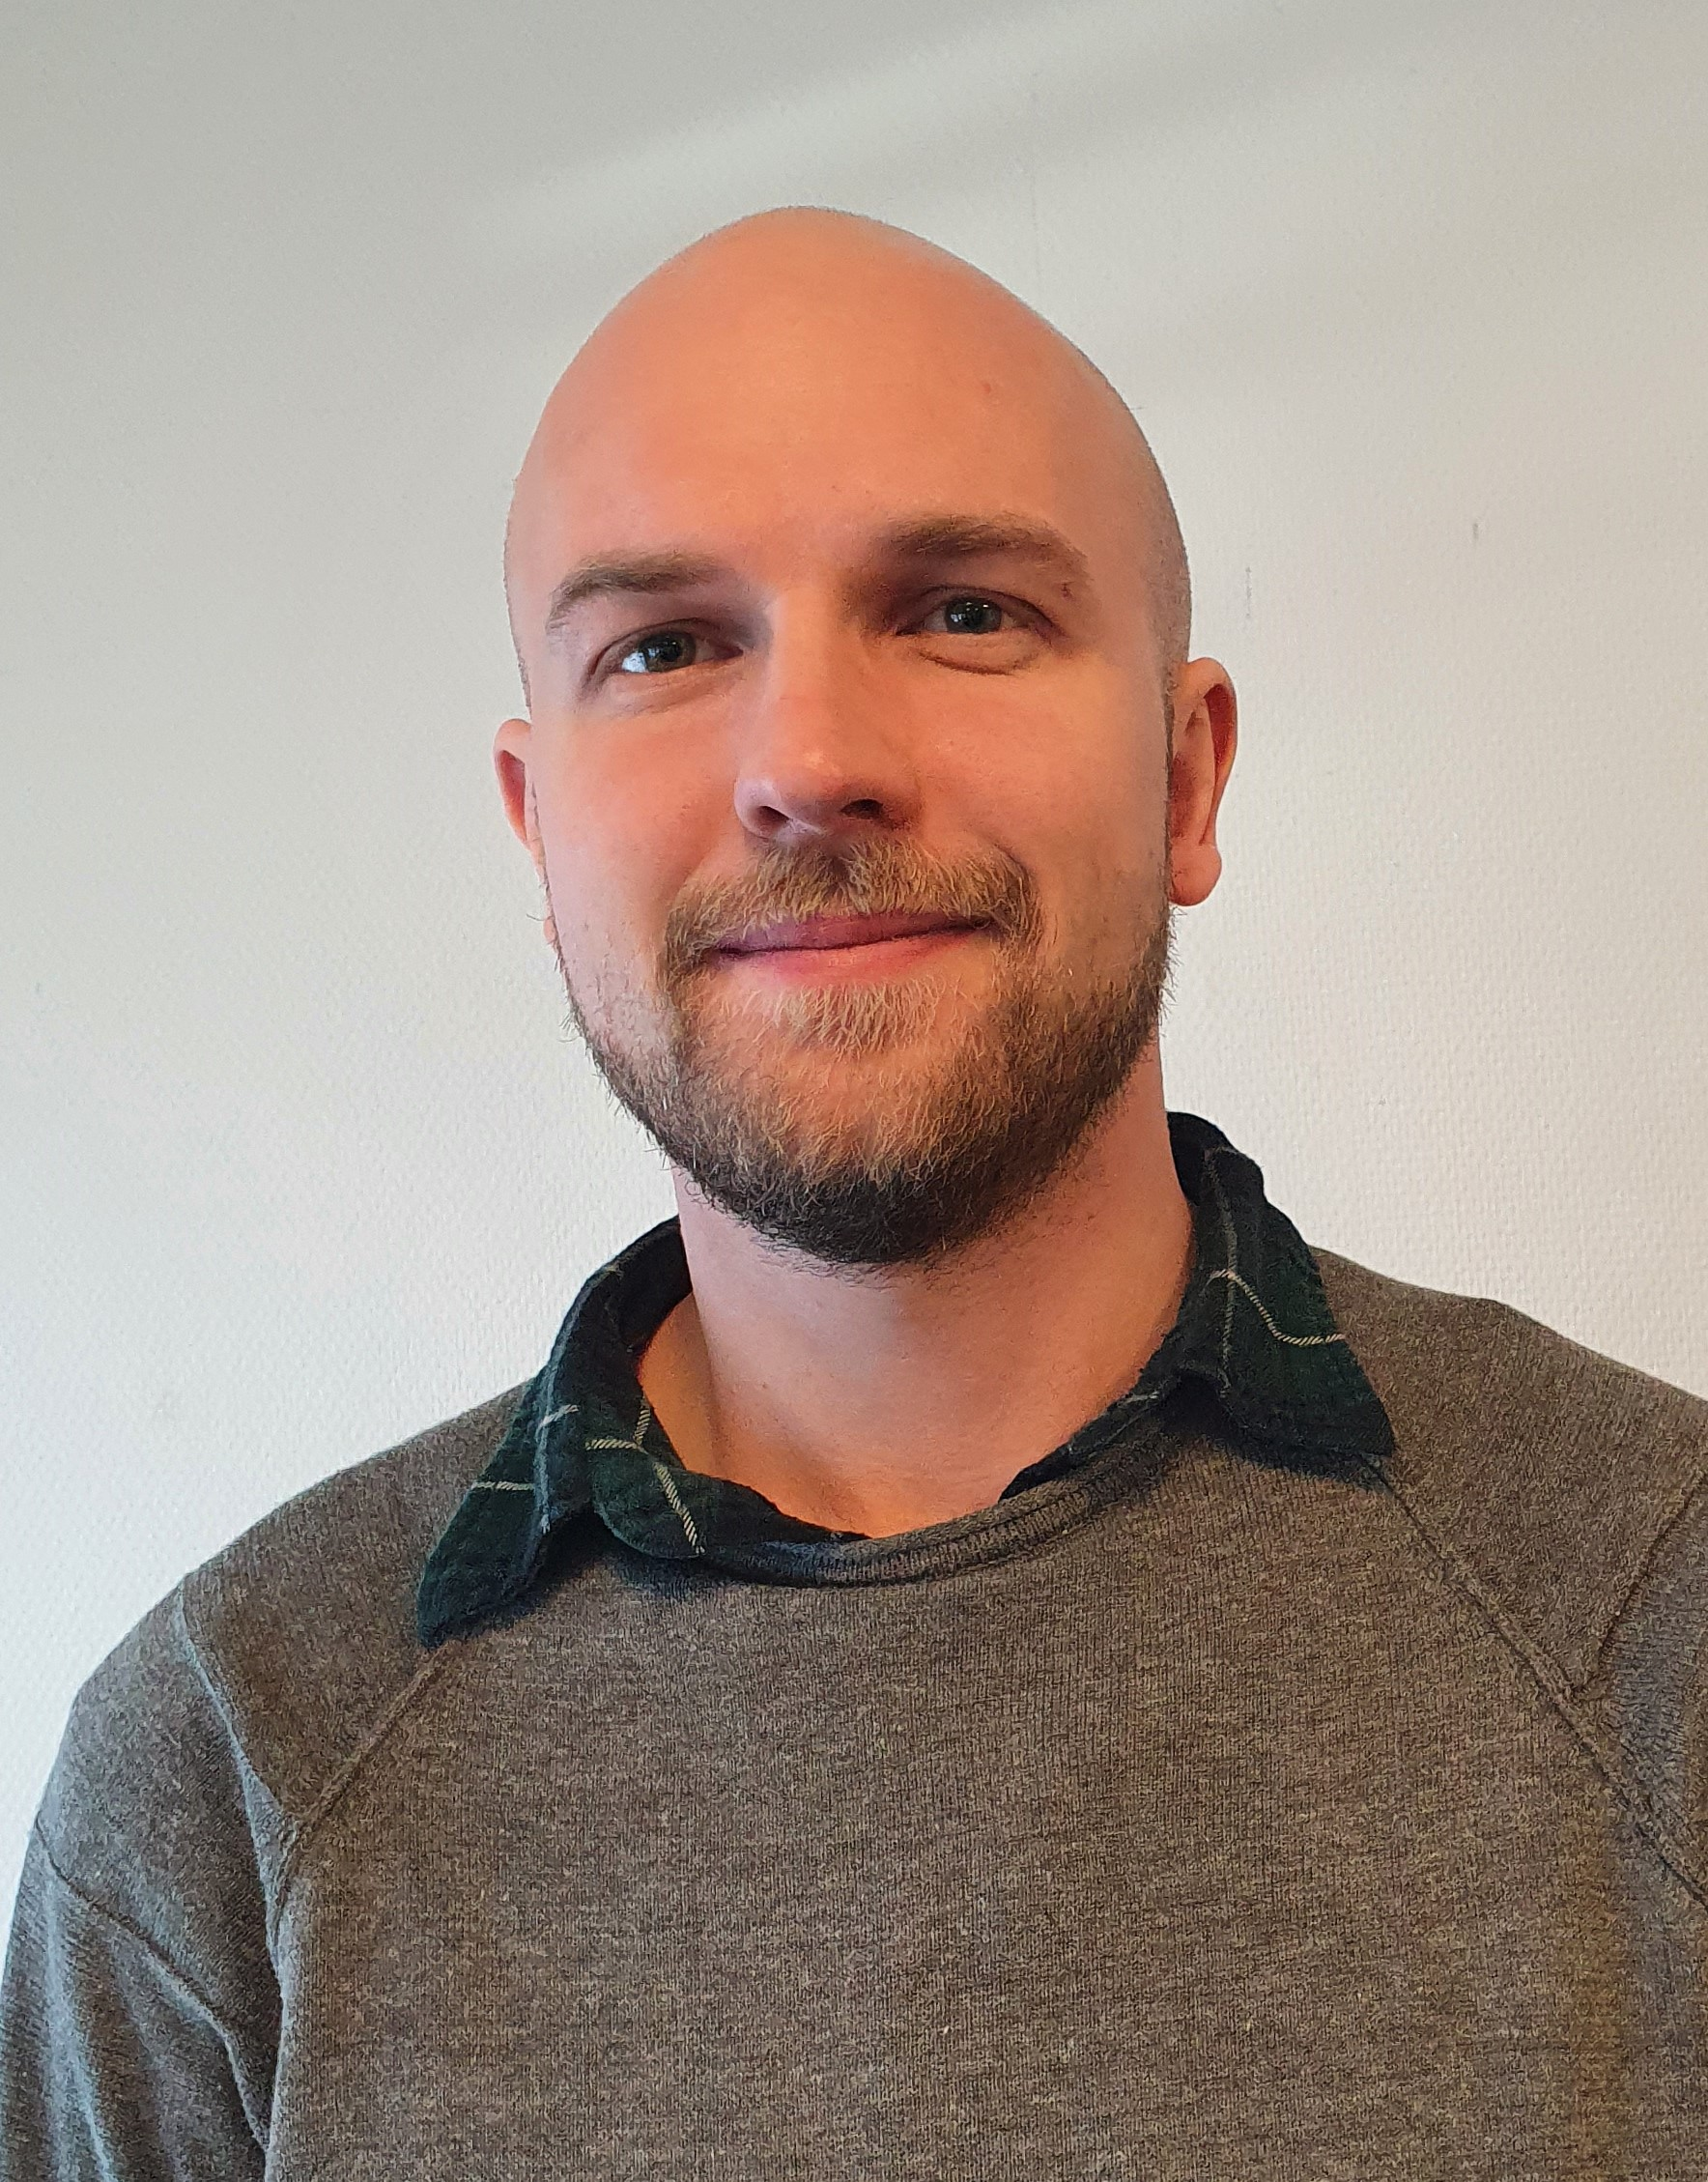 Mikkel Bruun Nielsen